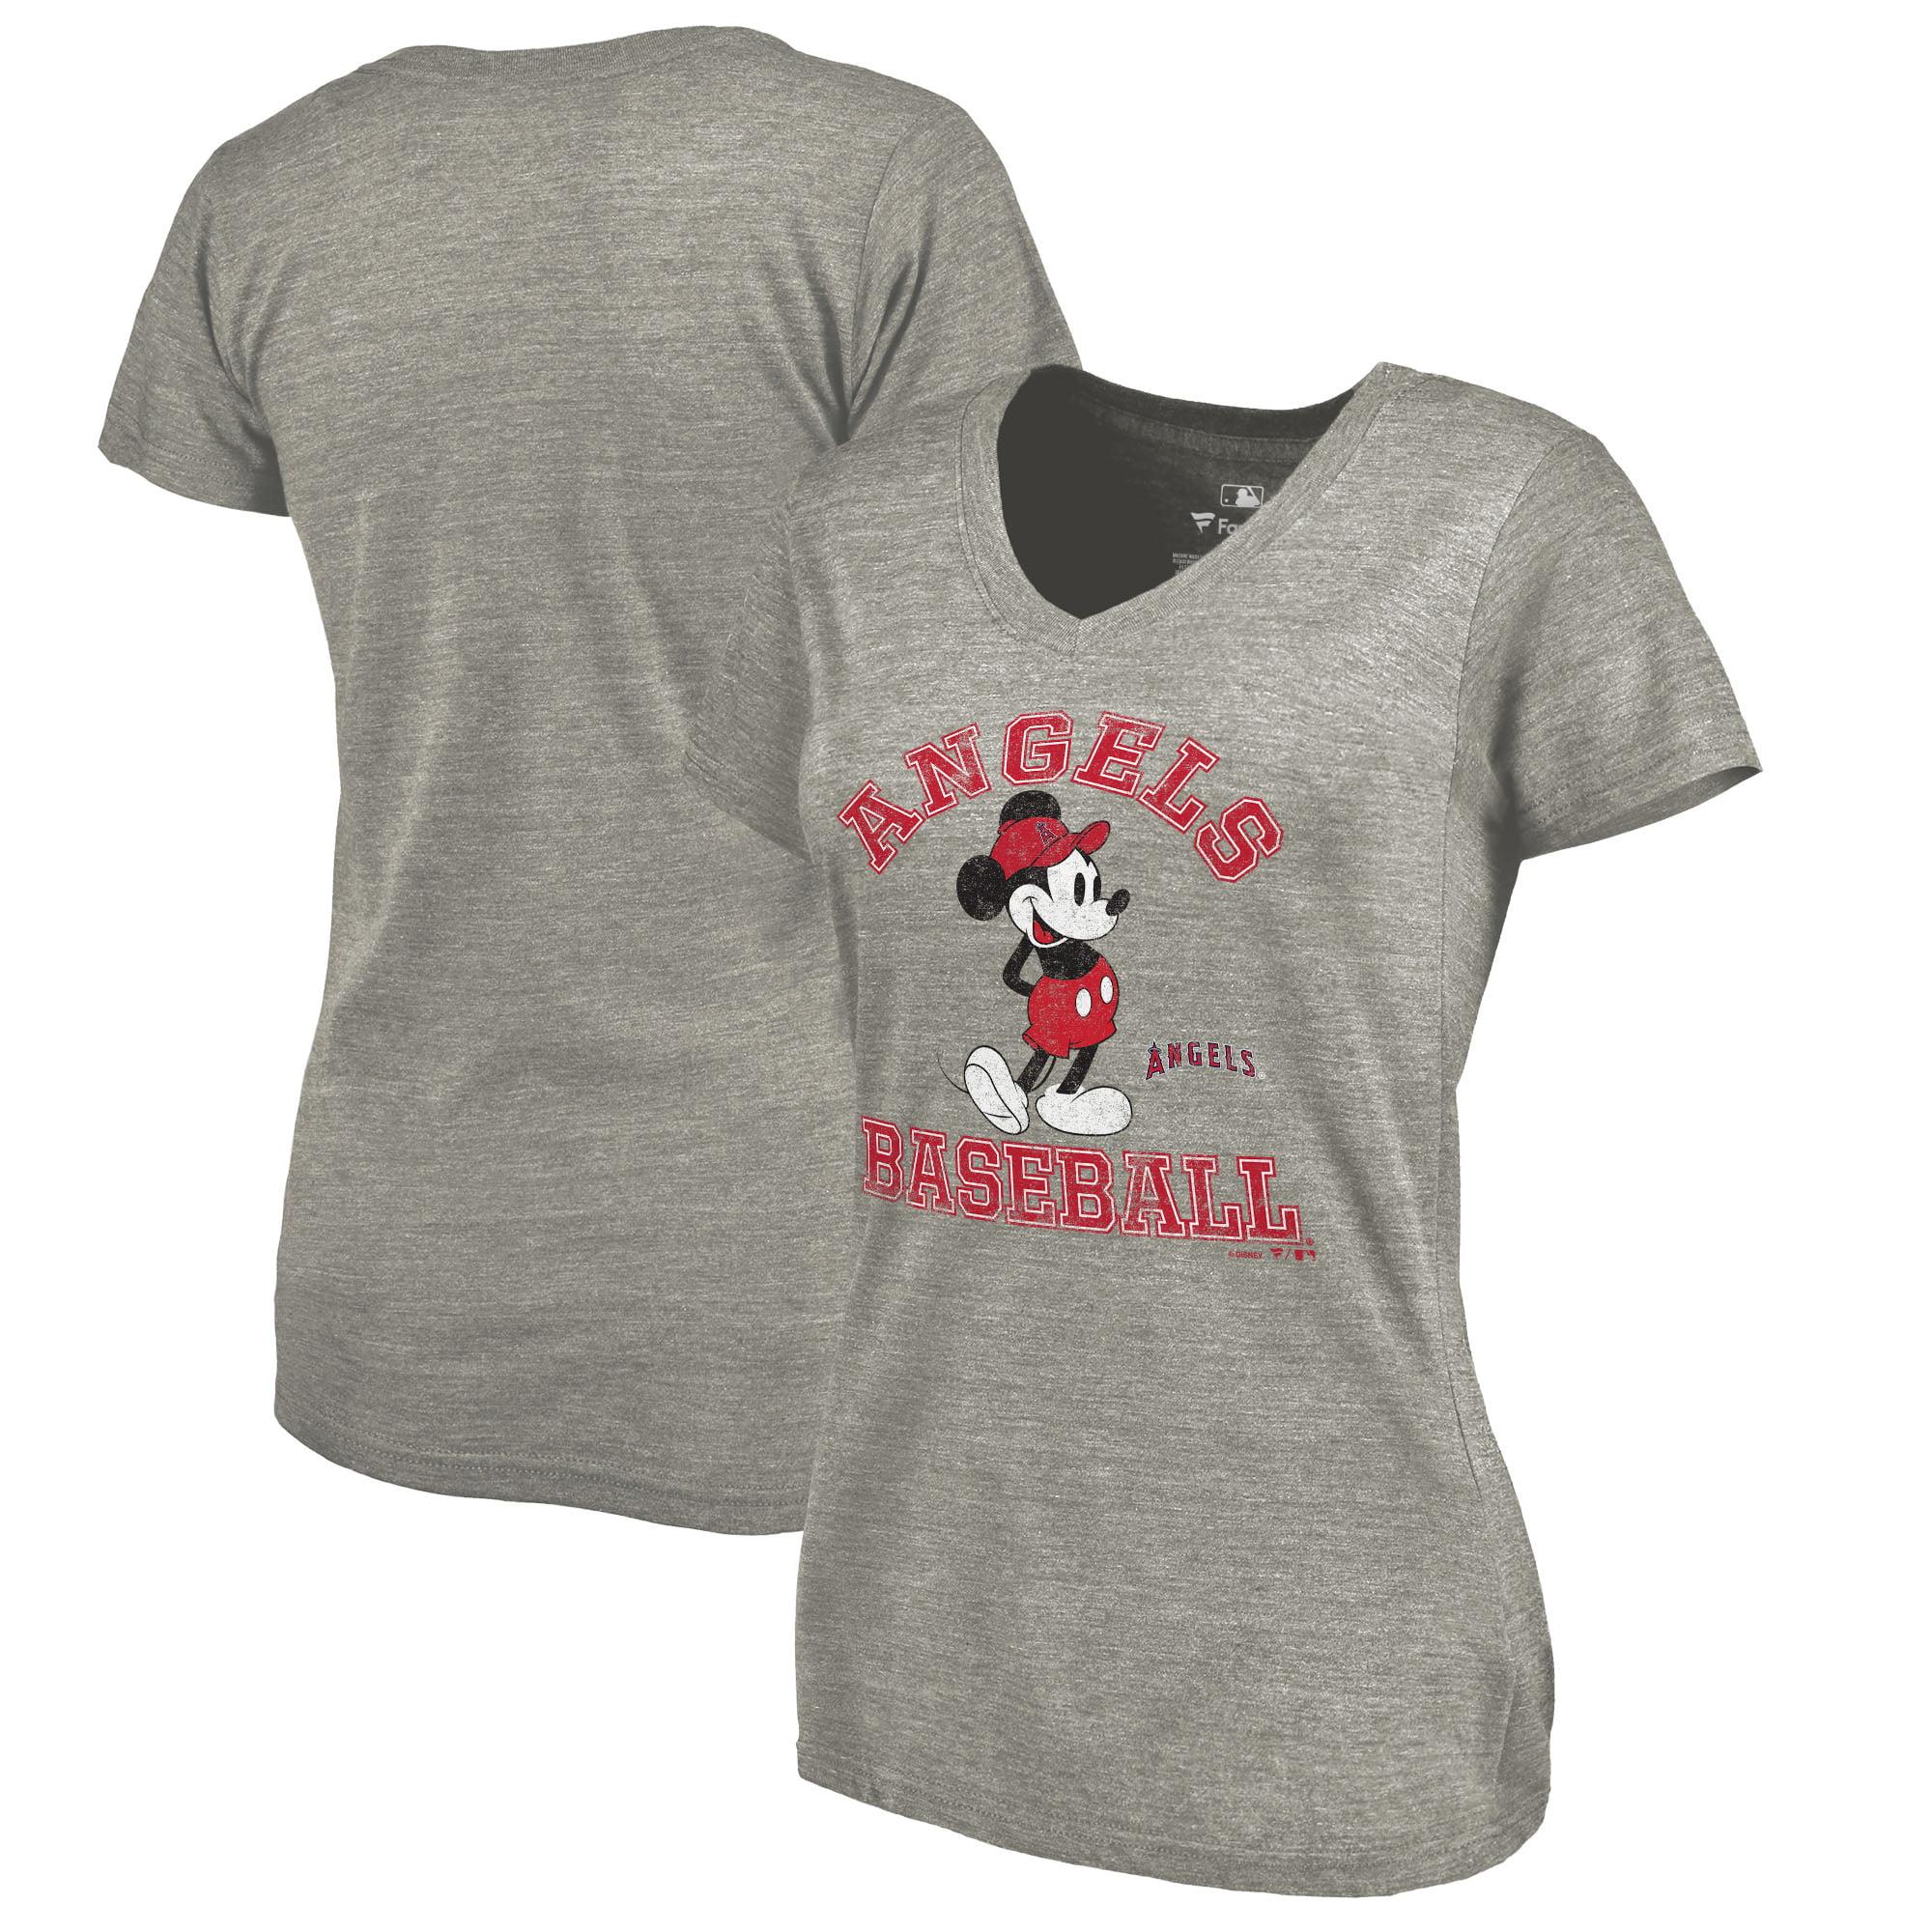 Los Angeles Angels Fanatics Branded Women's Disney MLB Tradition Tri-Blend V-Neck T-Shirt - Heathered Gray